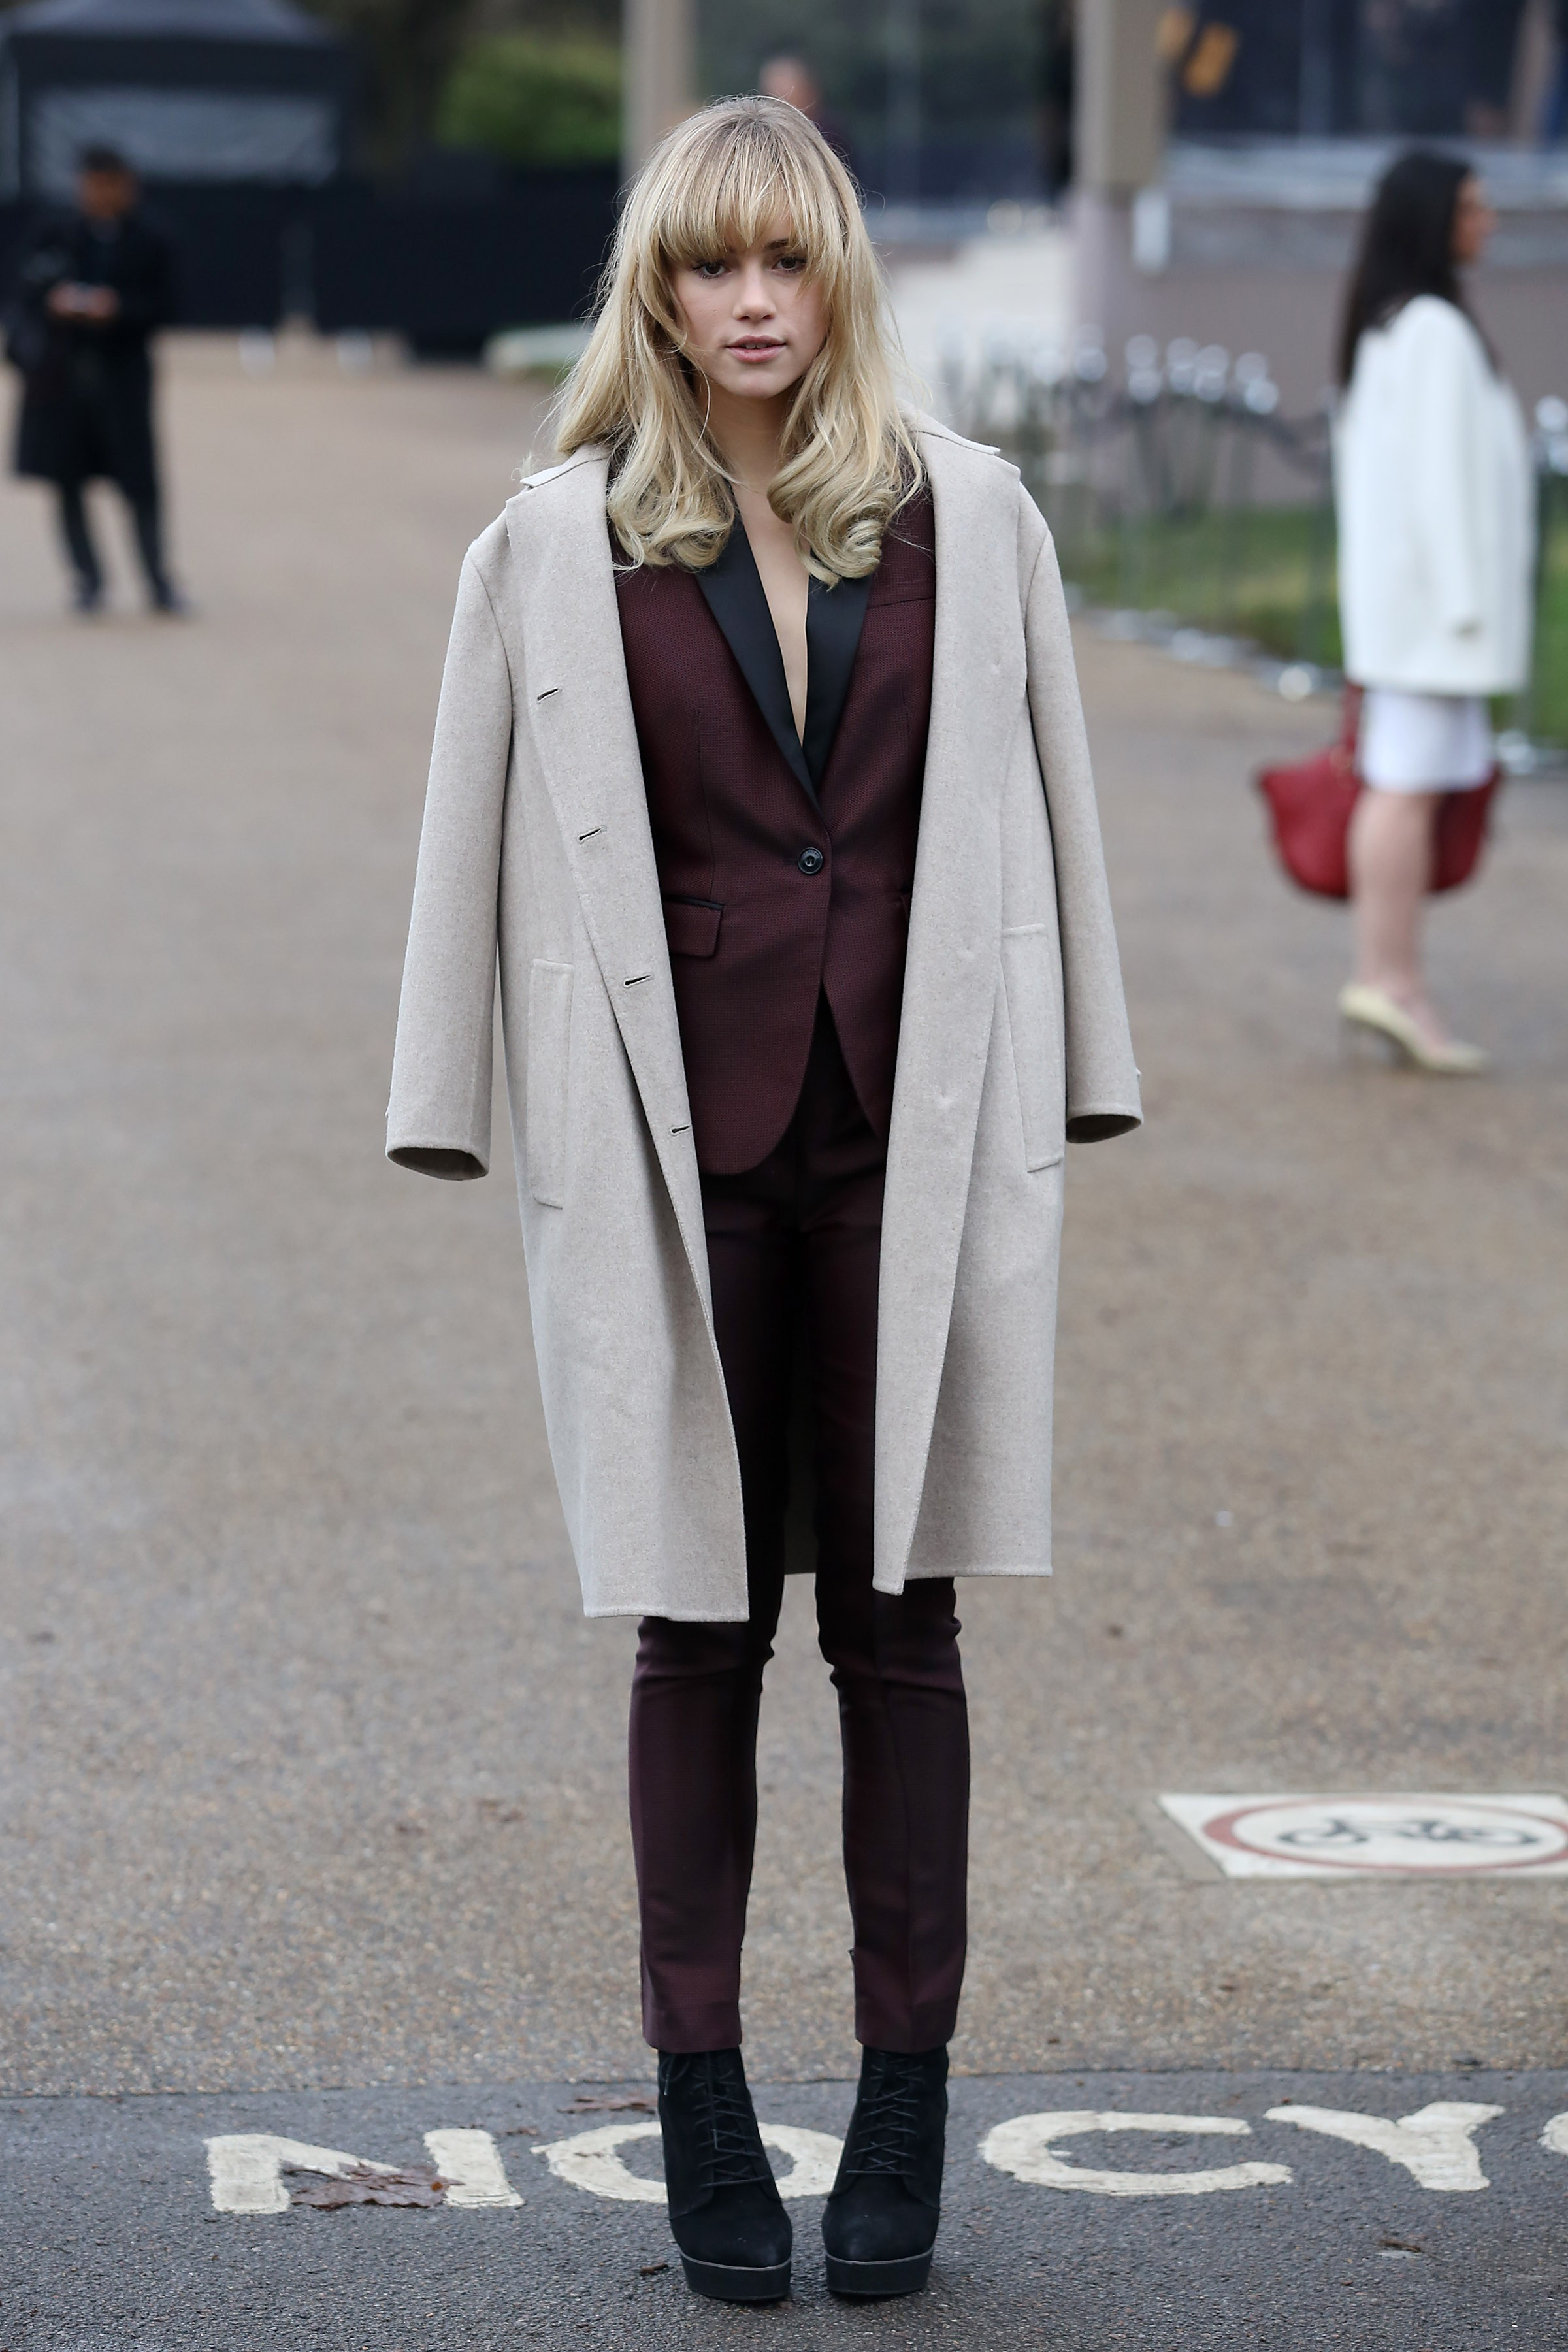 Celebrity Sightings In London - January 8, 2014